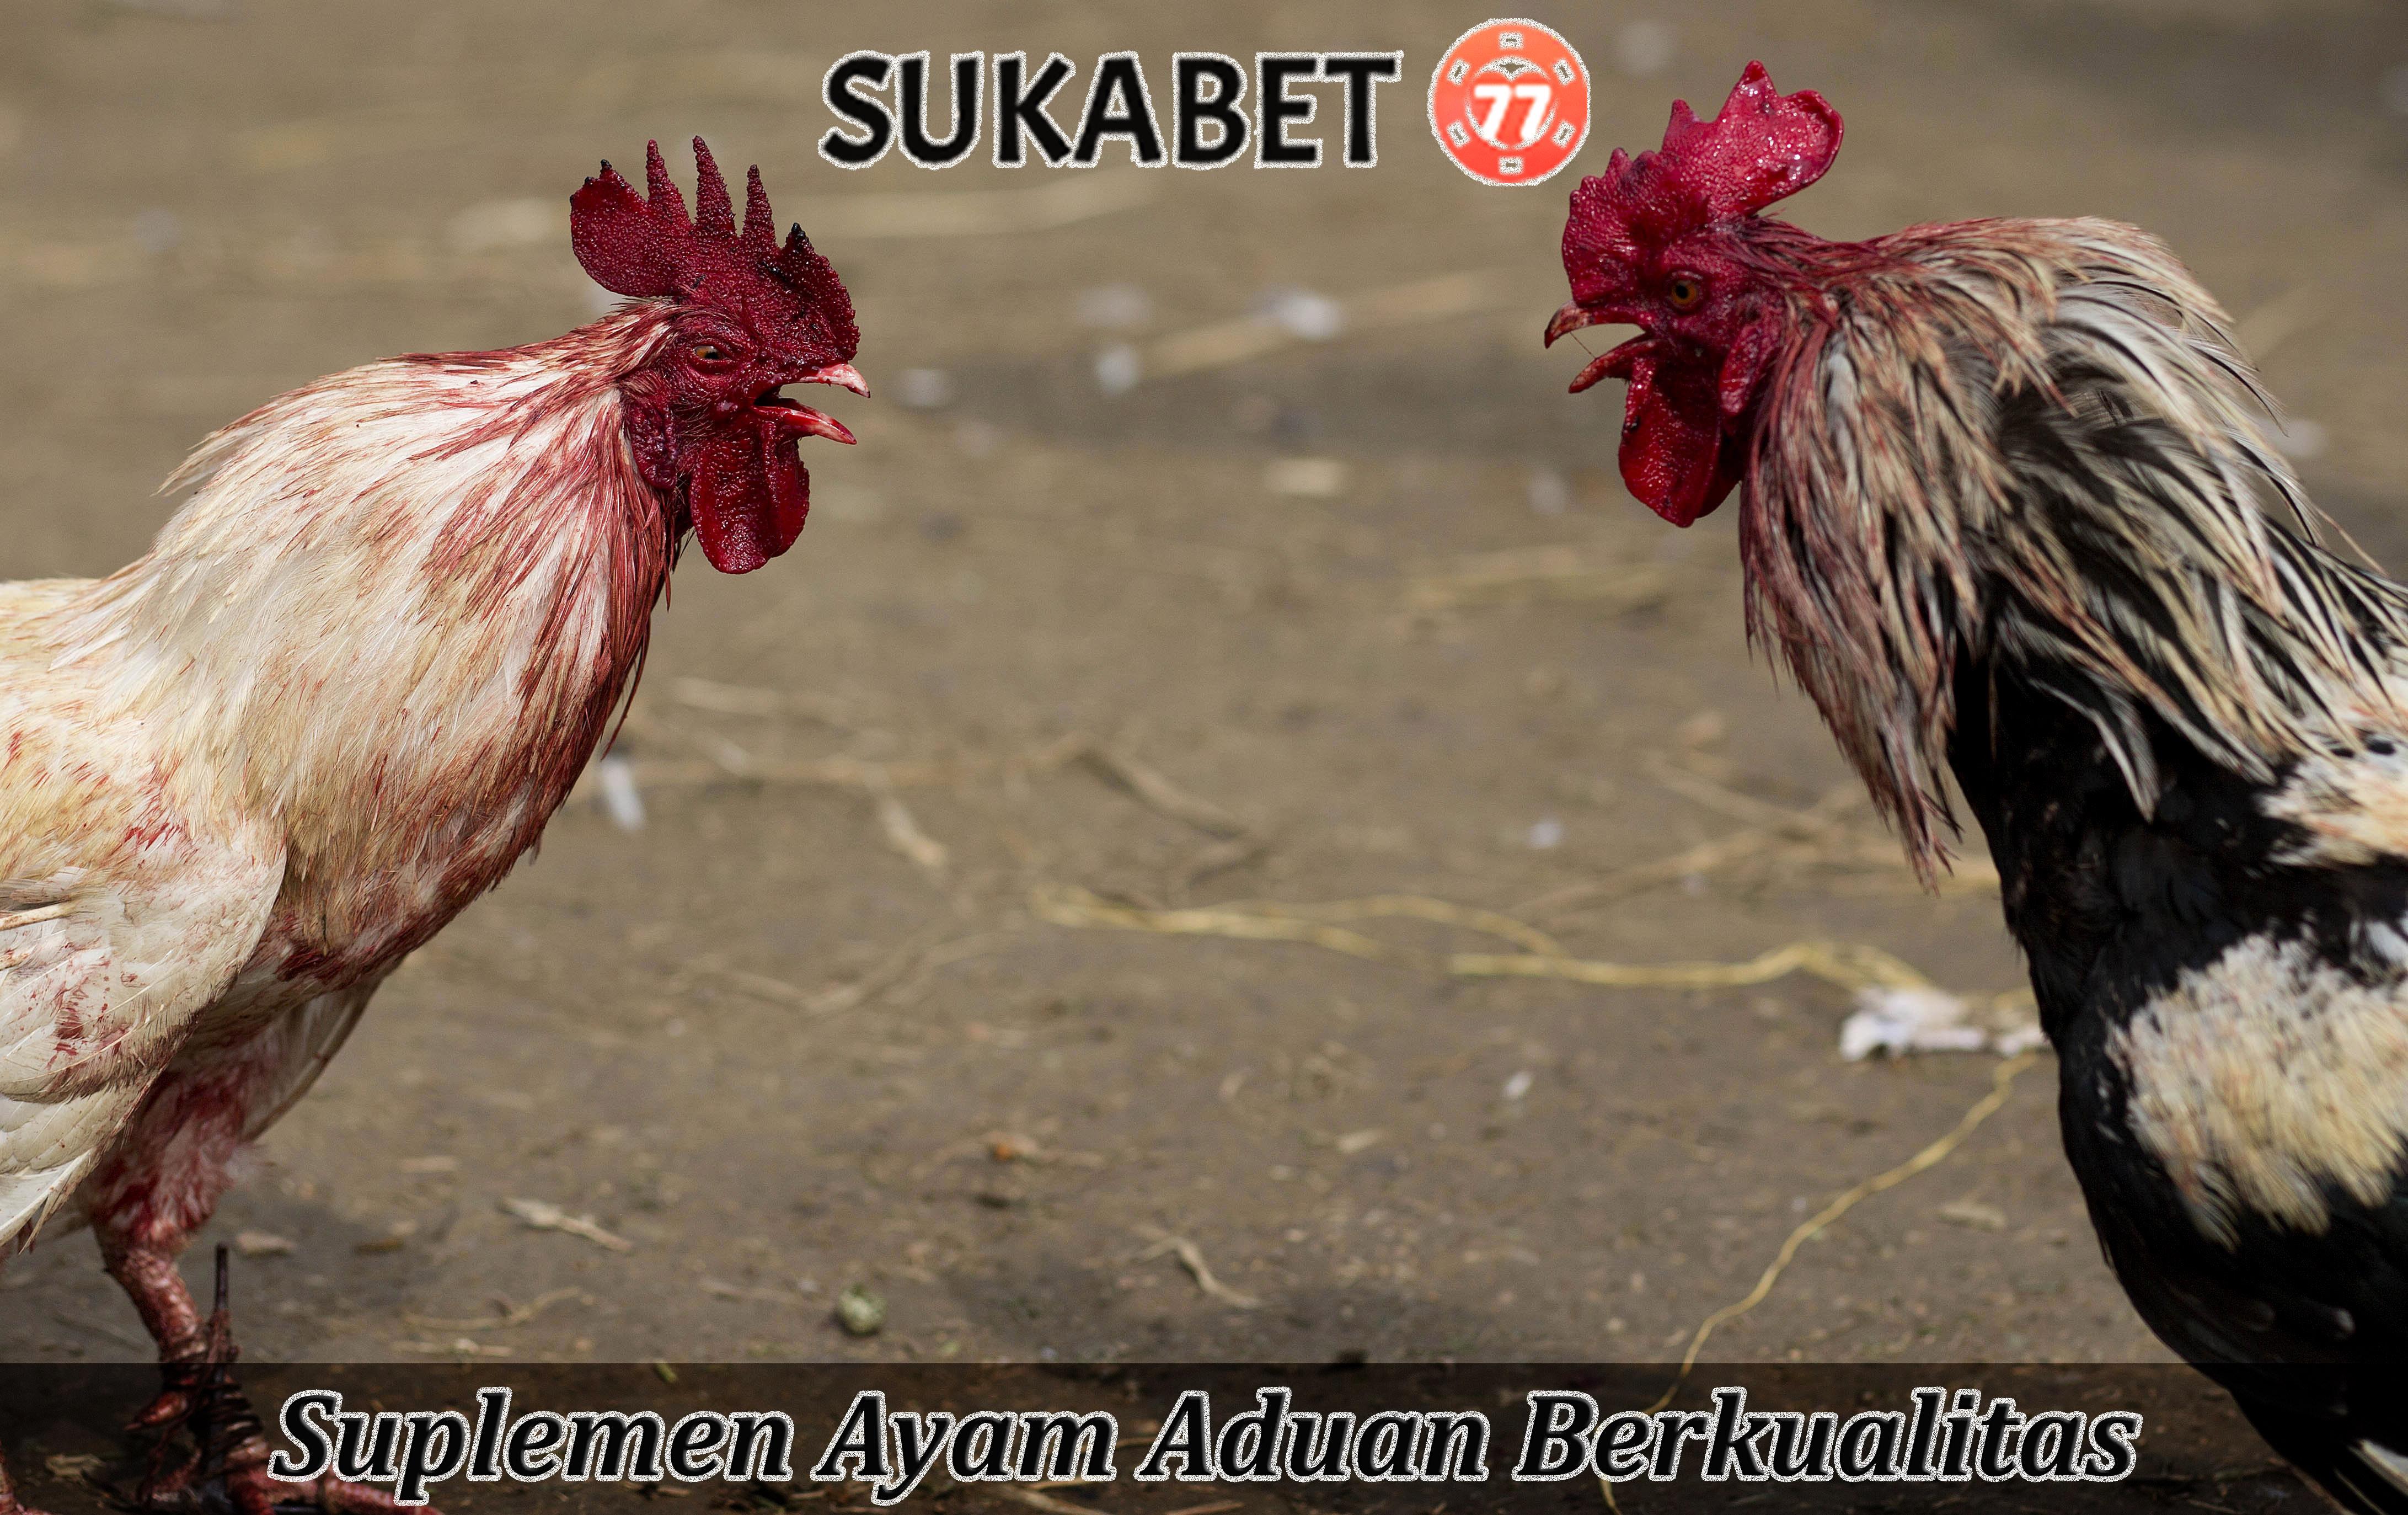 Suplemen Ayam Aduan Berkualitas